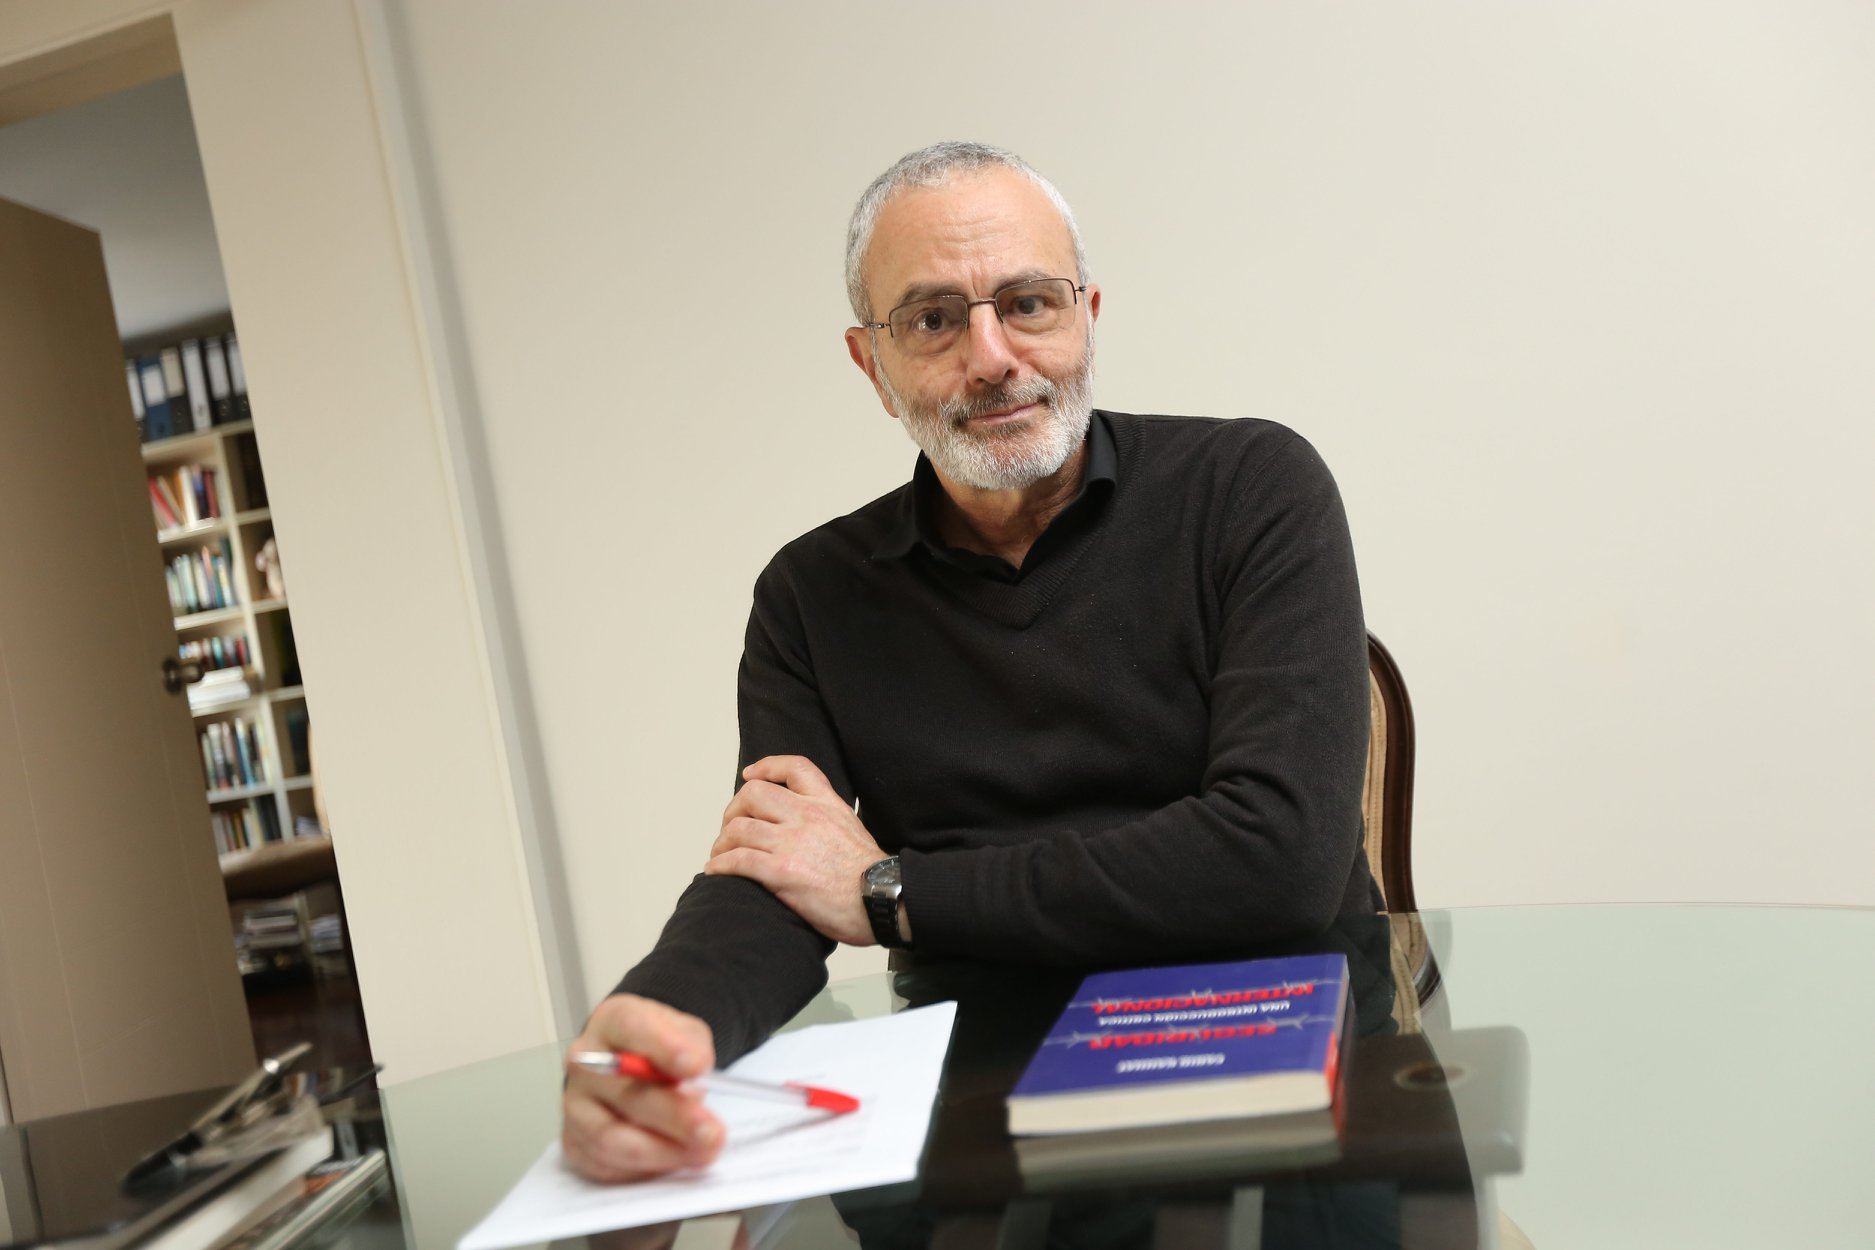 La pandemia del coronavirus y su impacto mundial, por Farid Kahhat